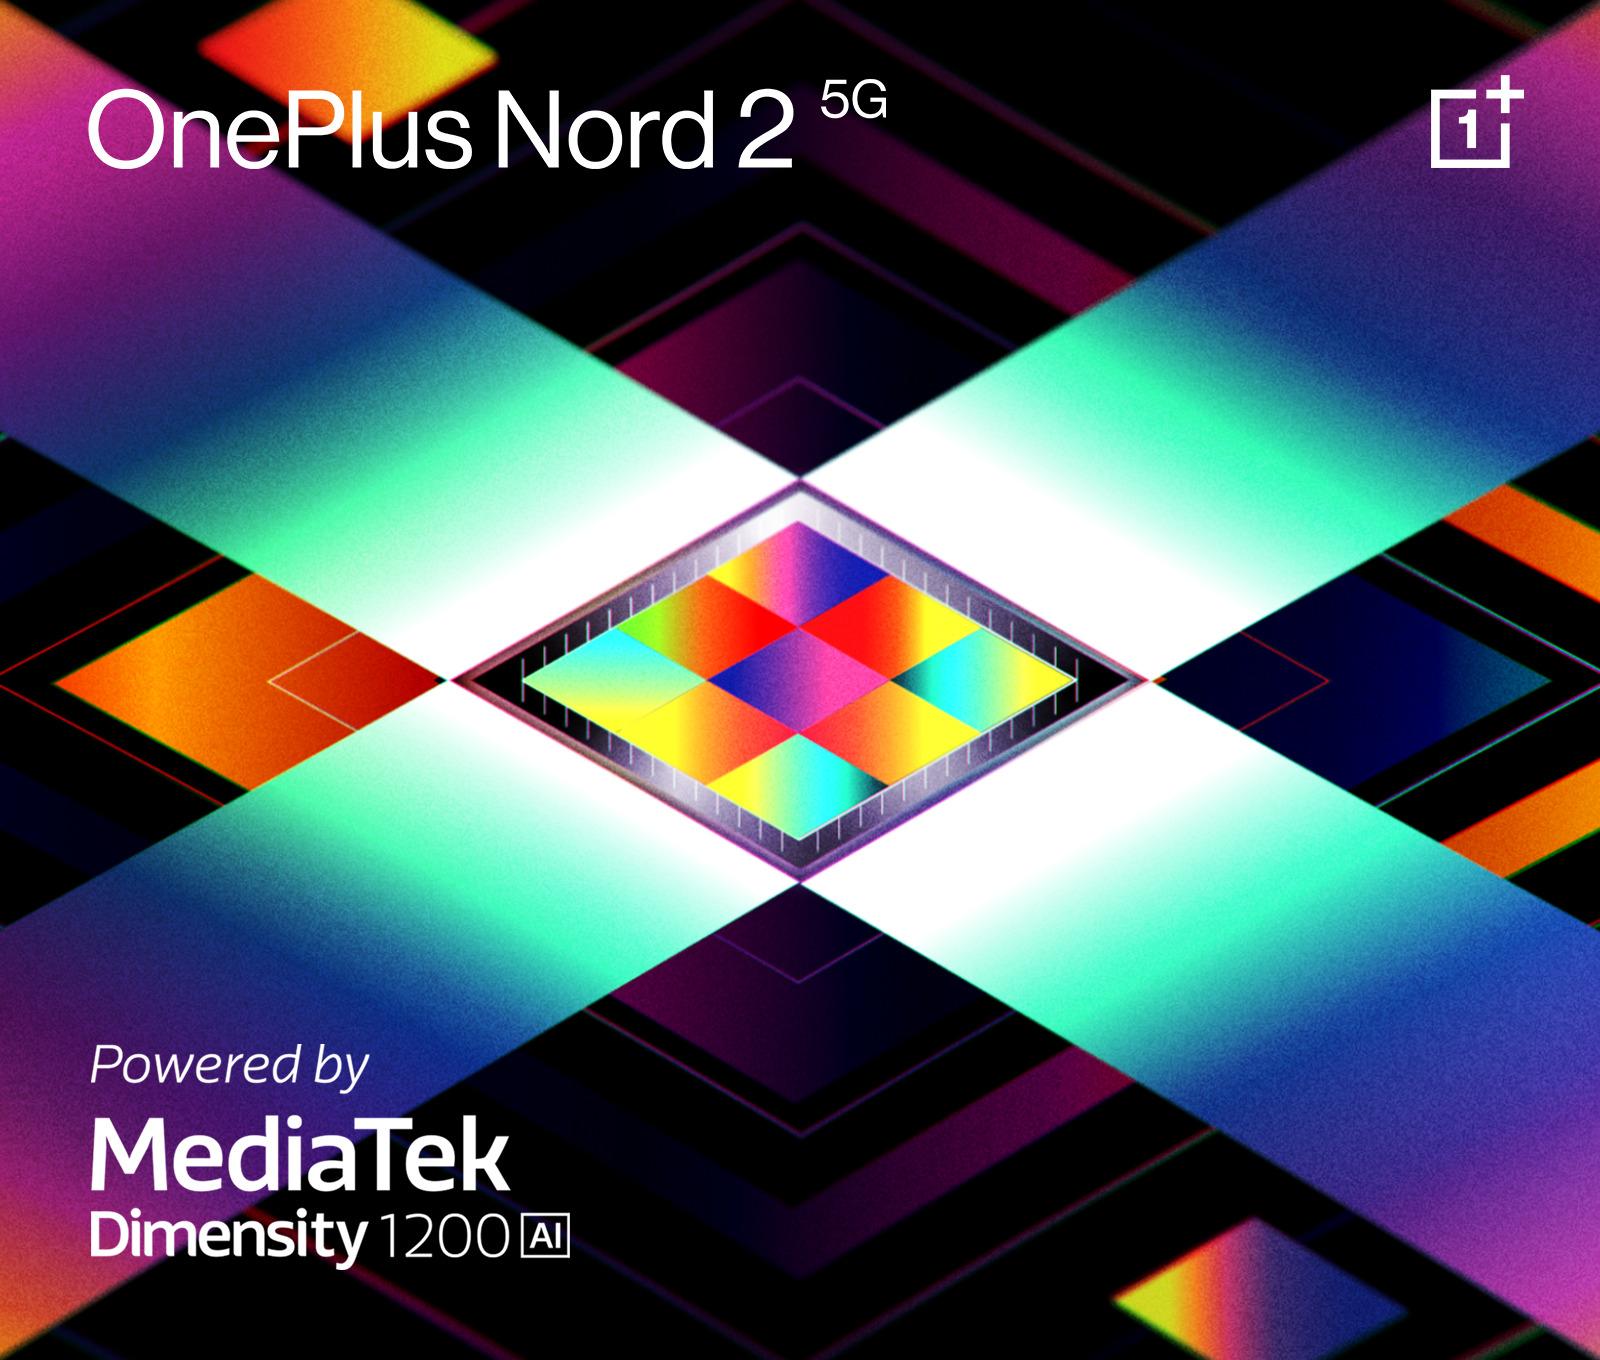 Le OnePlus Nord 2 inaugurera le SoC MediaTek Dimensity 1200-IA